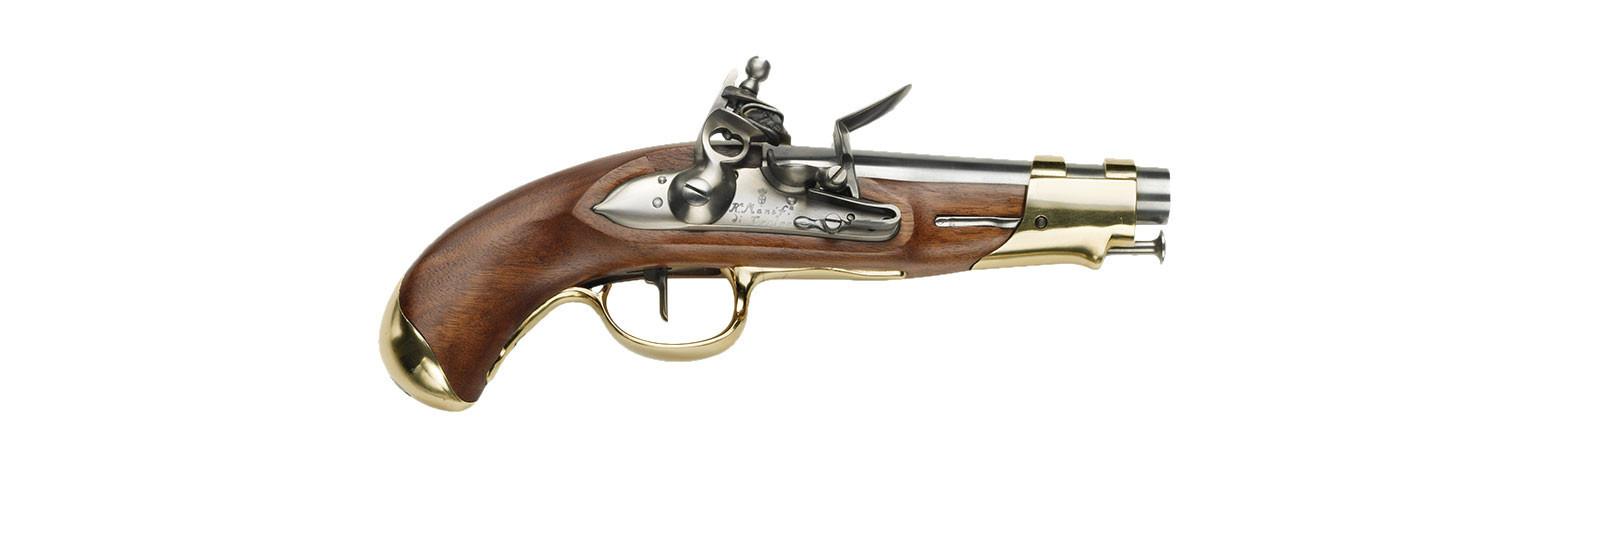 Mod.1814 Pistol Reale dei Carabinieri